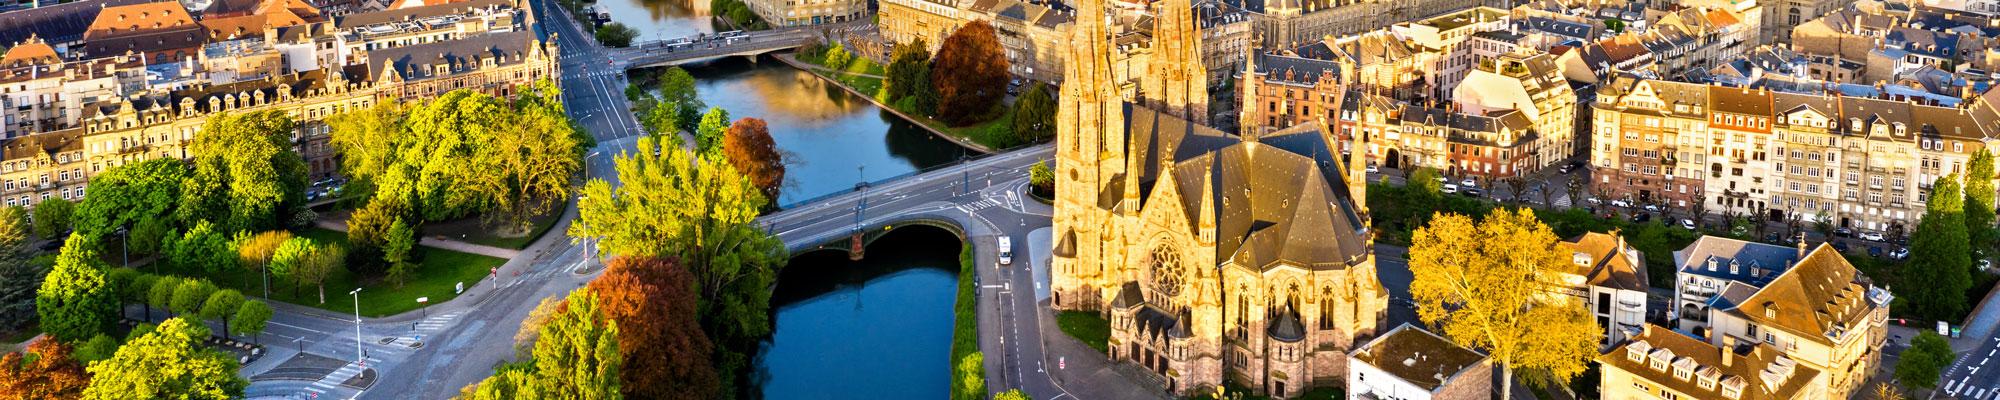 MBA à Strasbourg / Diplôme Bac+5 en alternance